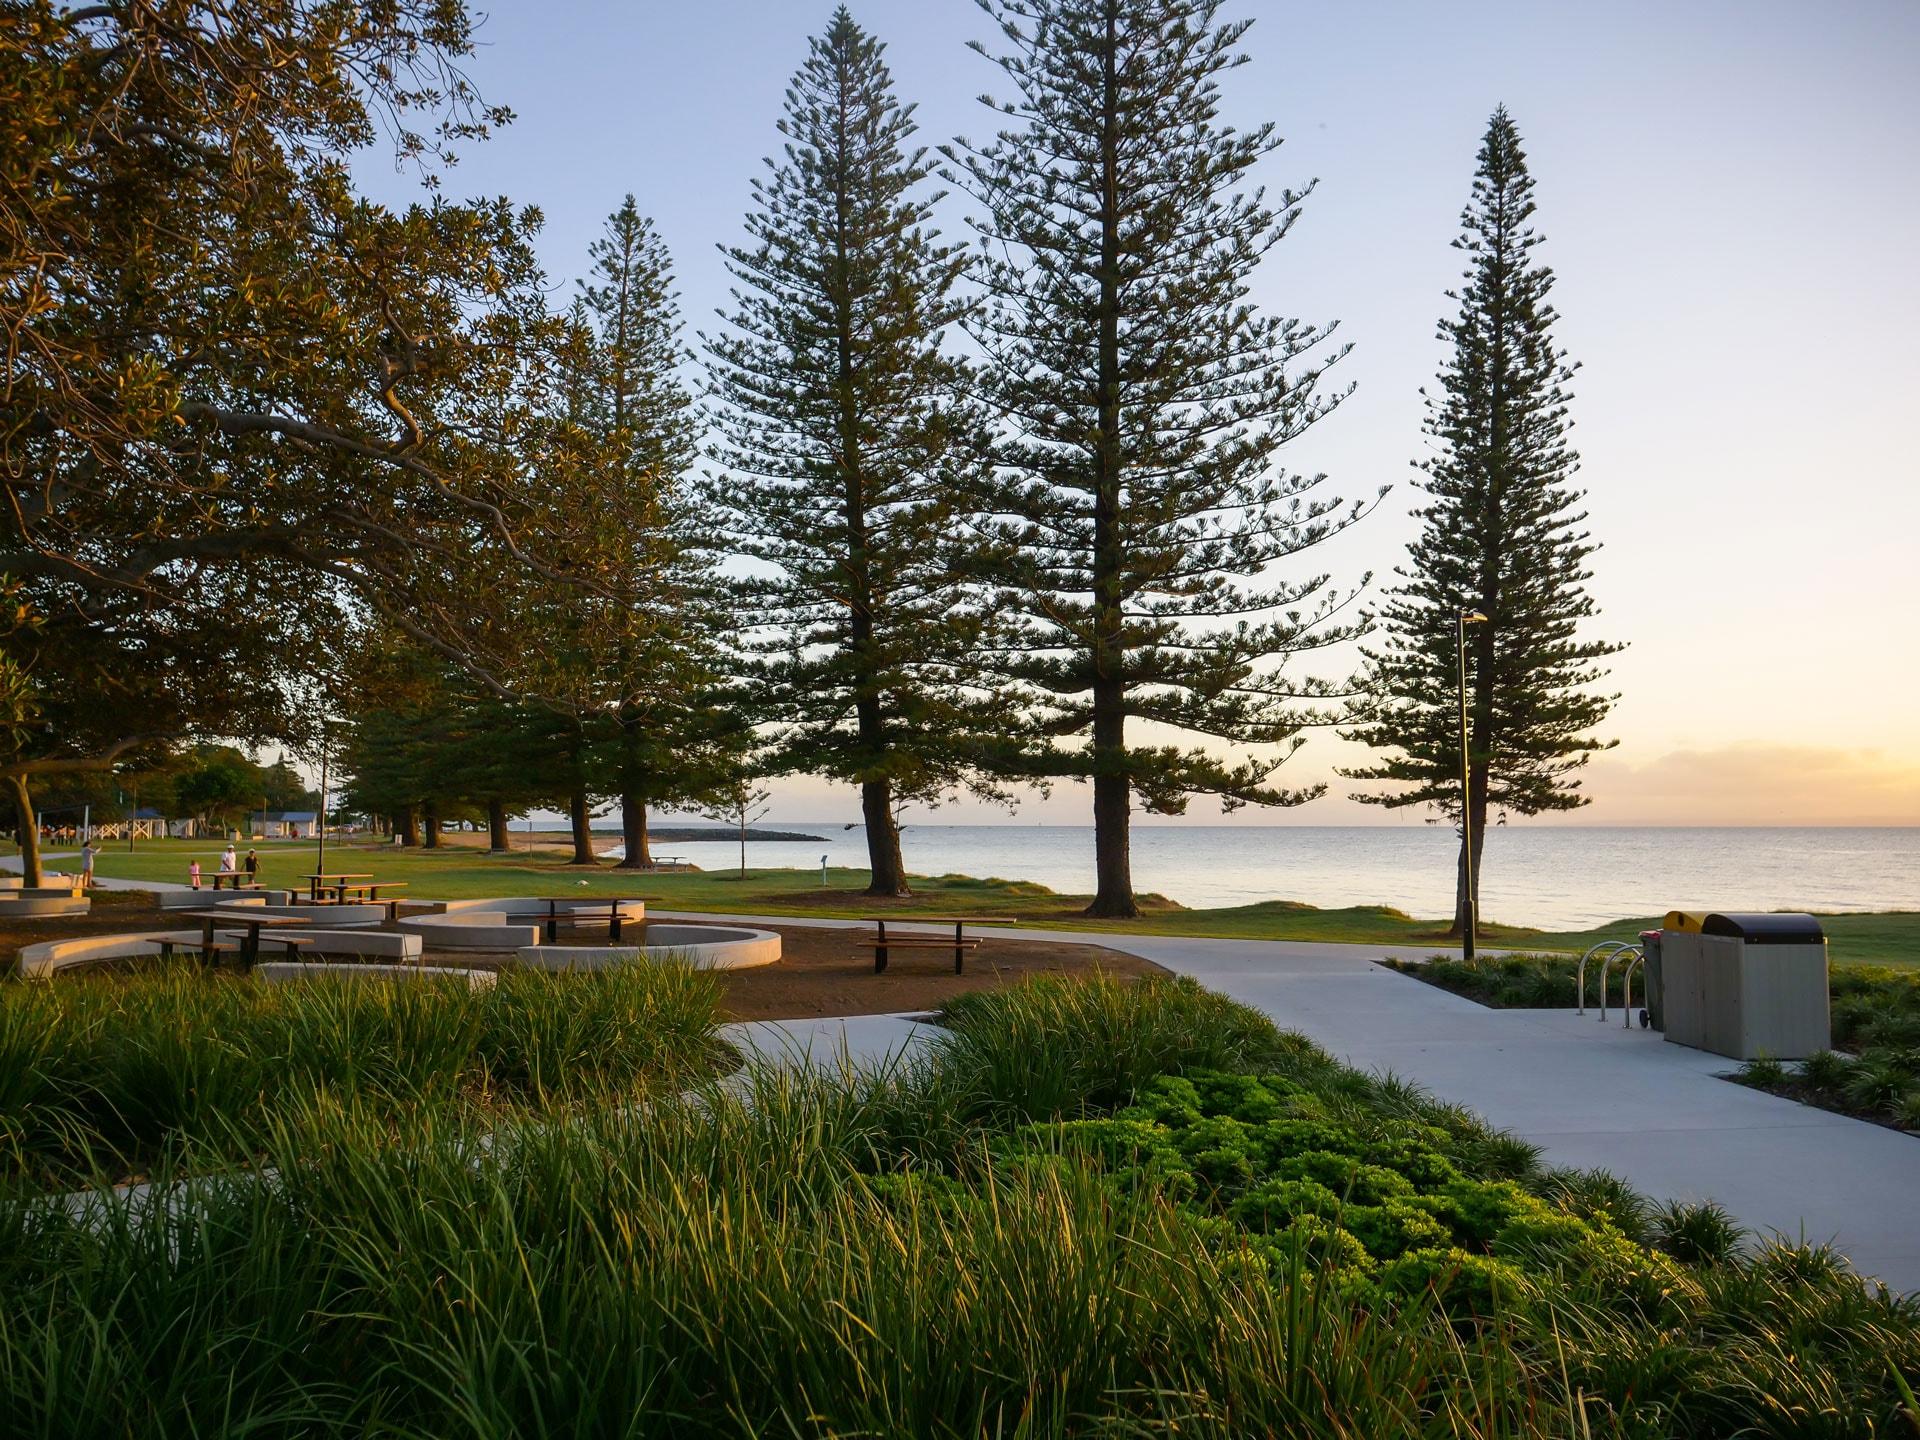 3.-Scarborough-Beach-Park-P1033748.jpg